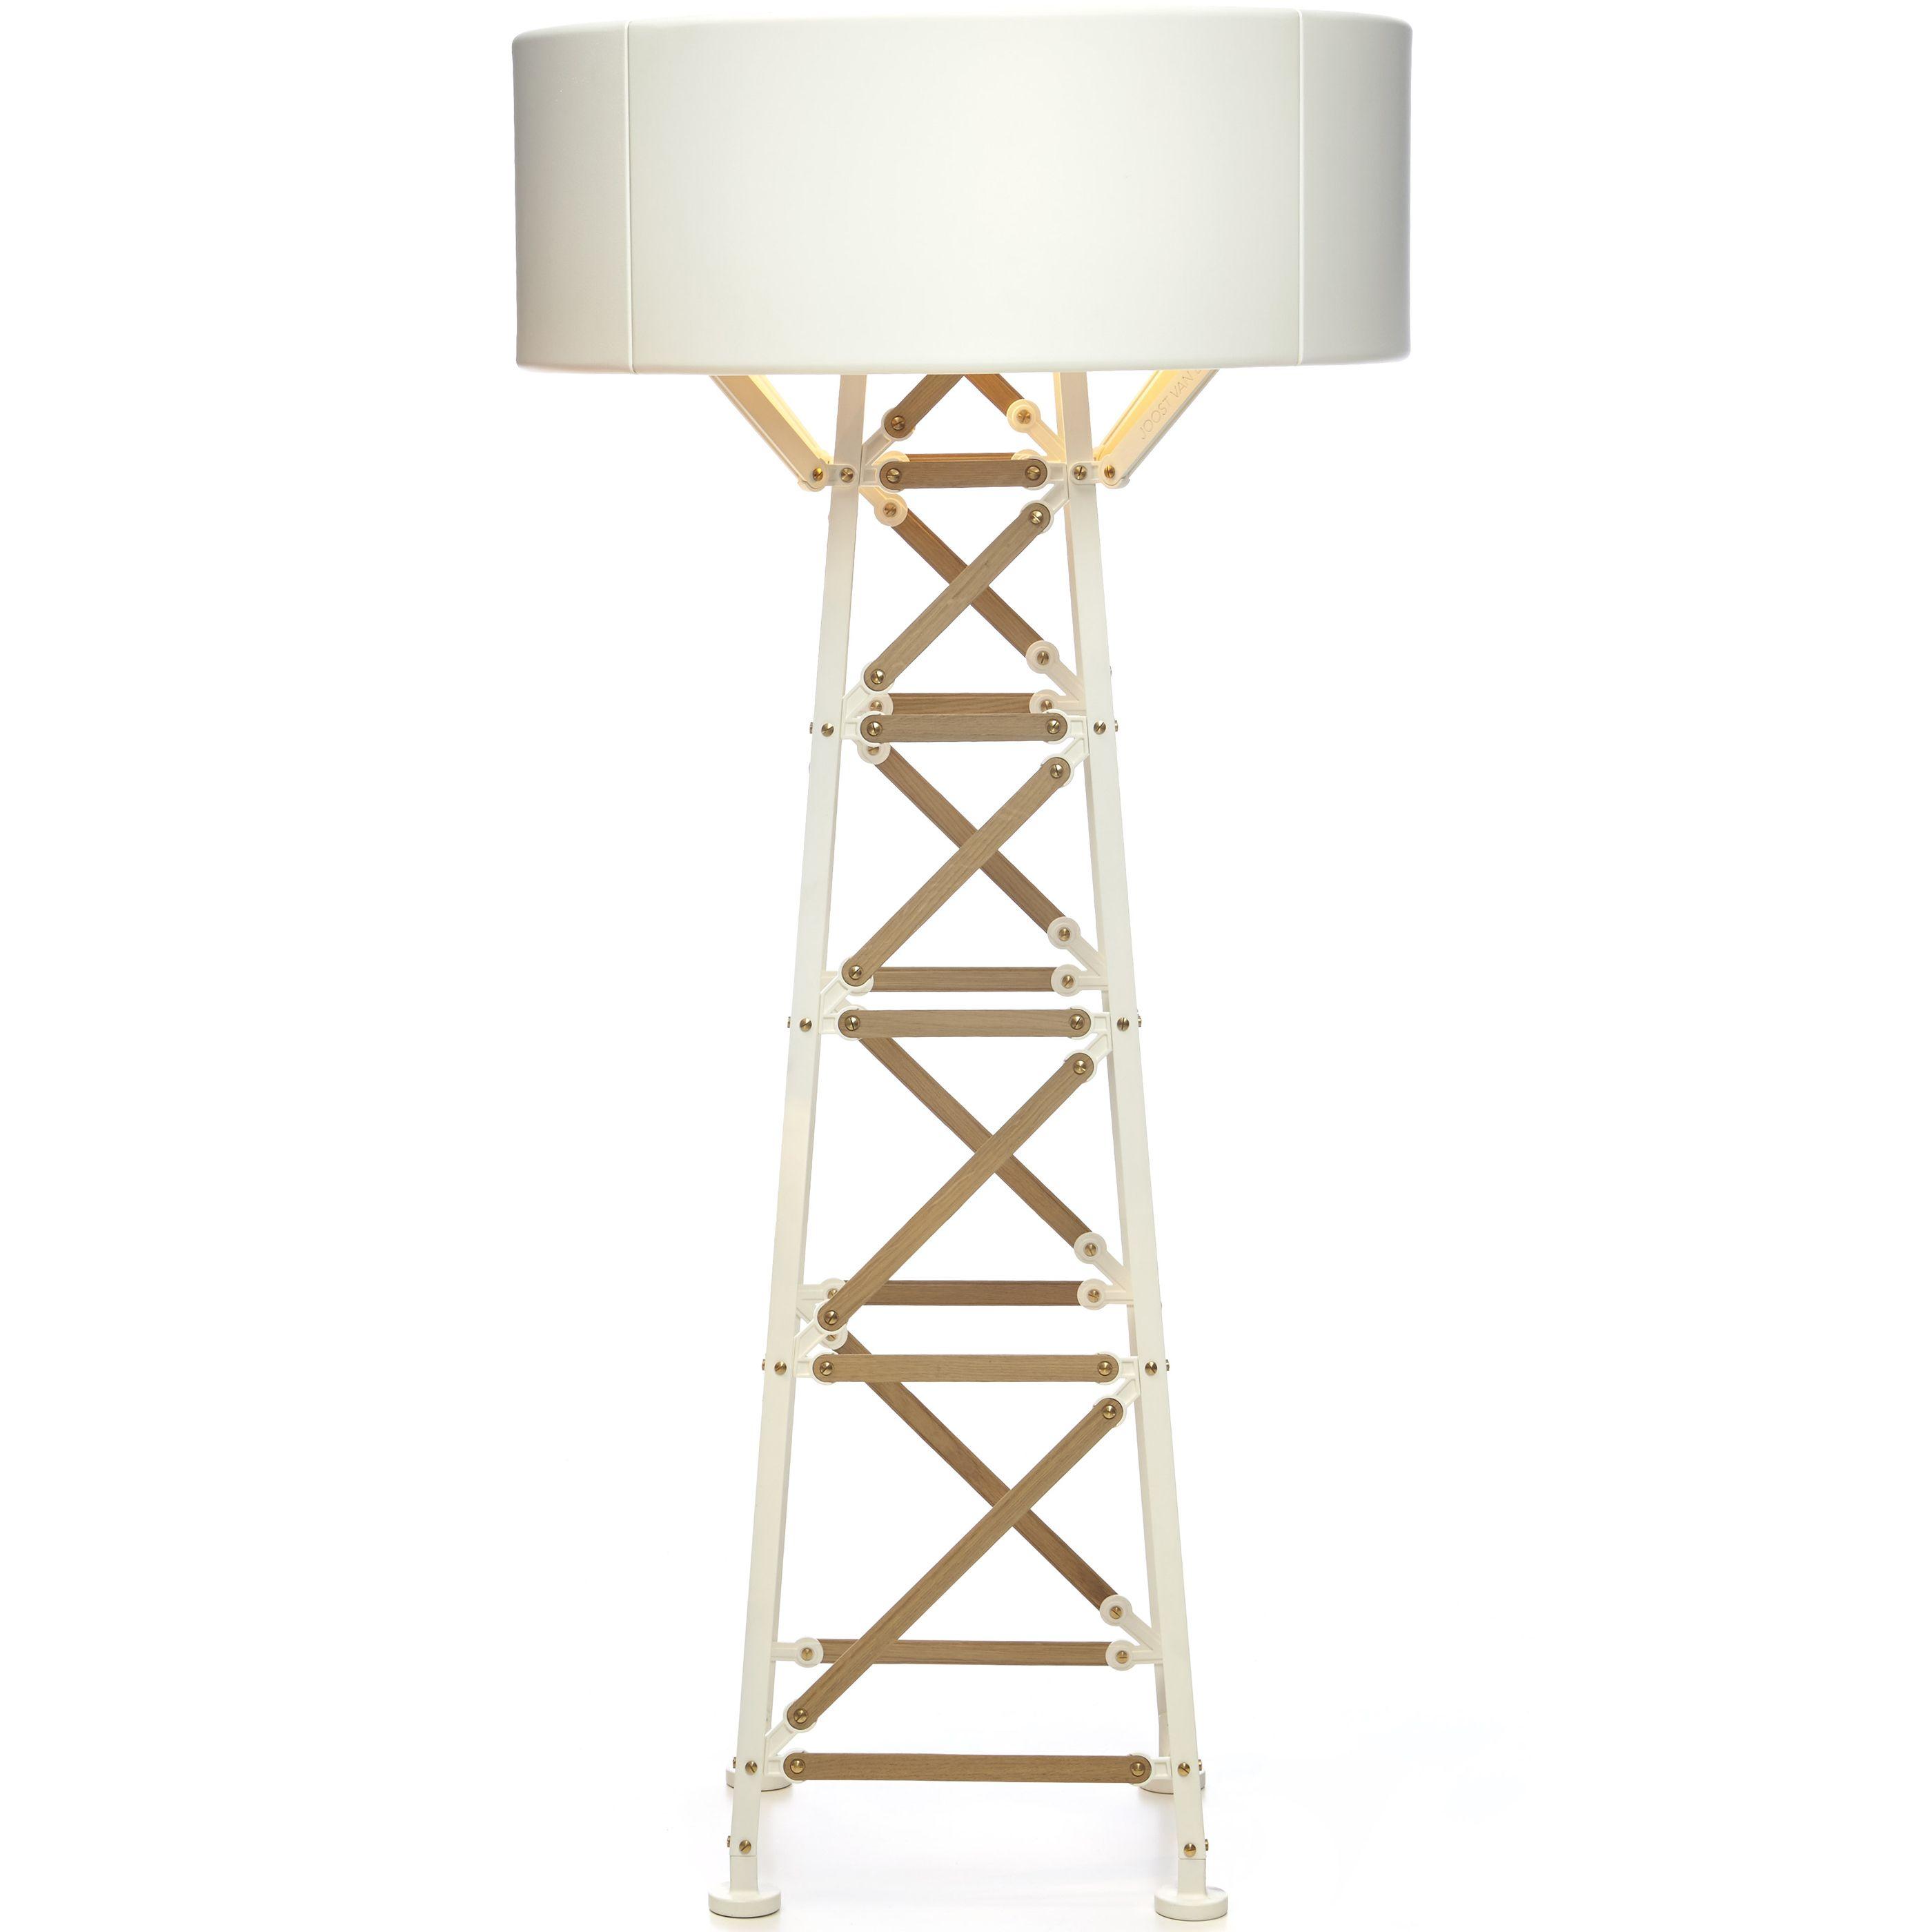 Houten Vloerlamp Aanbieding.Moooi Construction Lamp Vloerlamp Medium